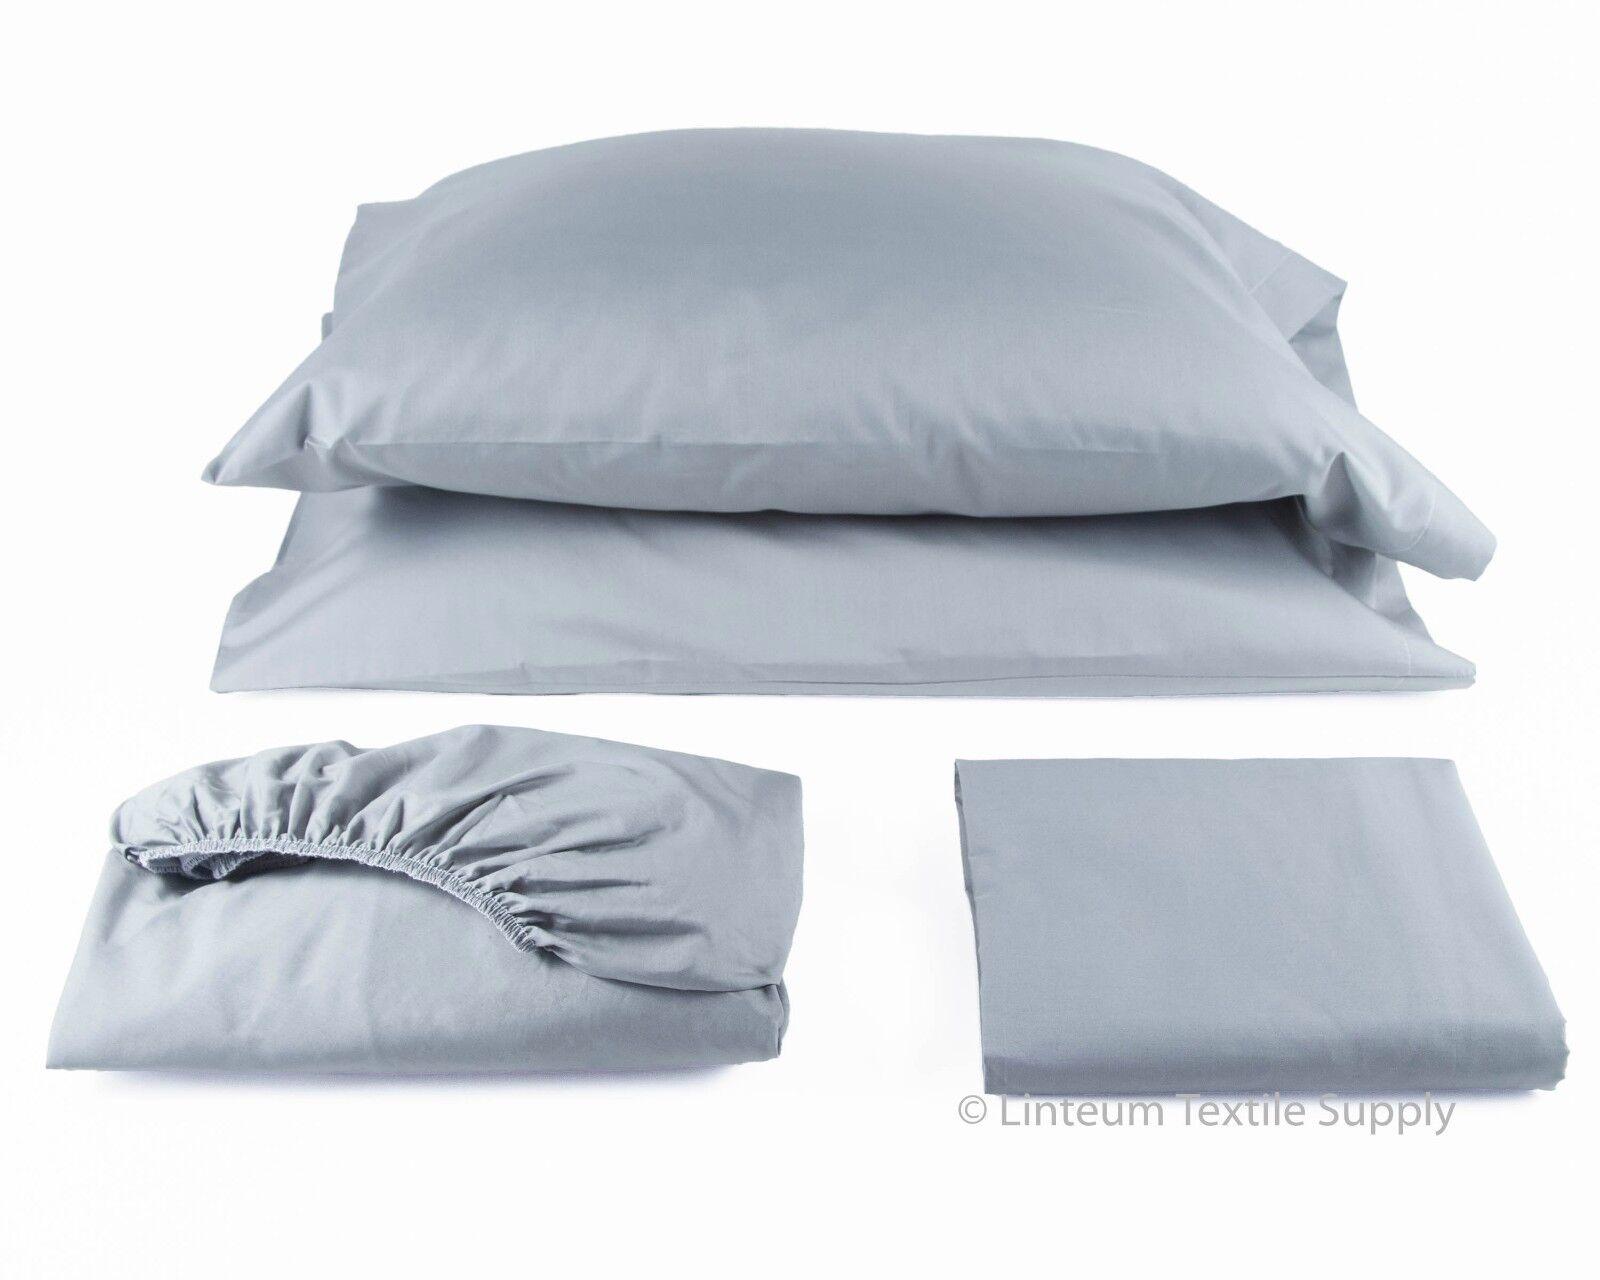 linteum 100 cotton 4 piece bed sheet set 250 thread count wholesale lot queen ebay. Black Bedroom Furniture Sets. Home Design Ideas